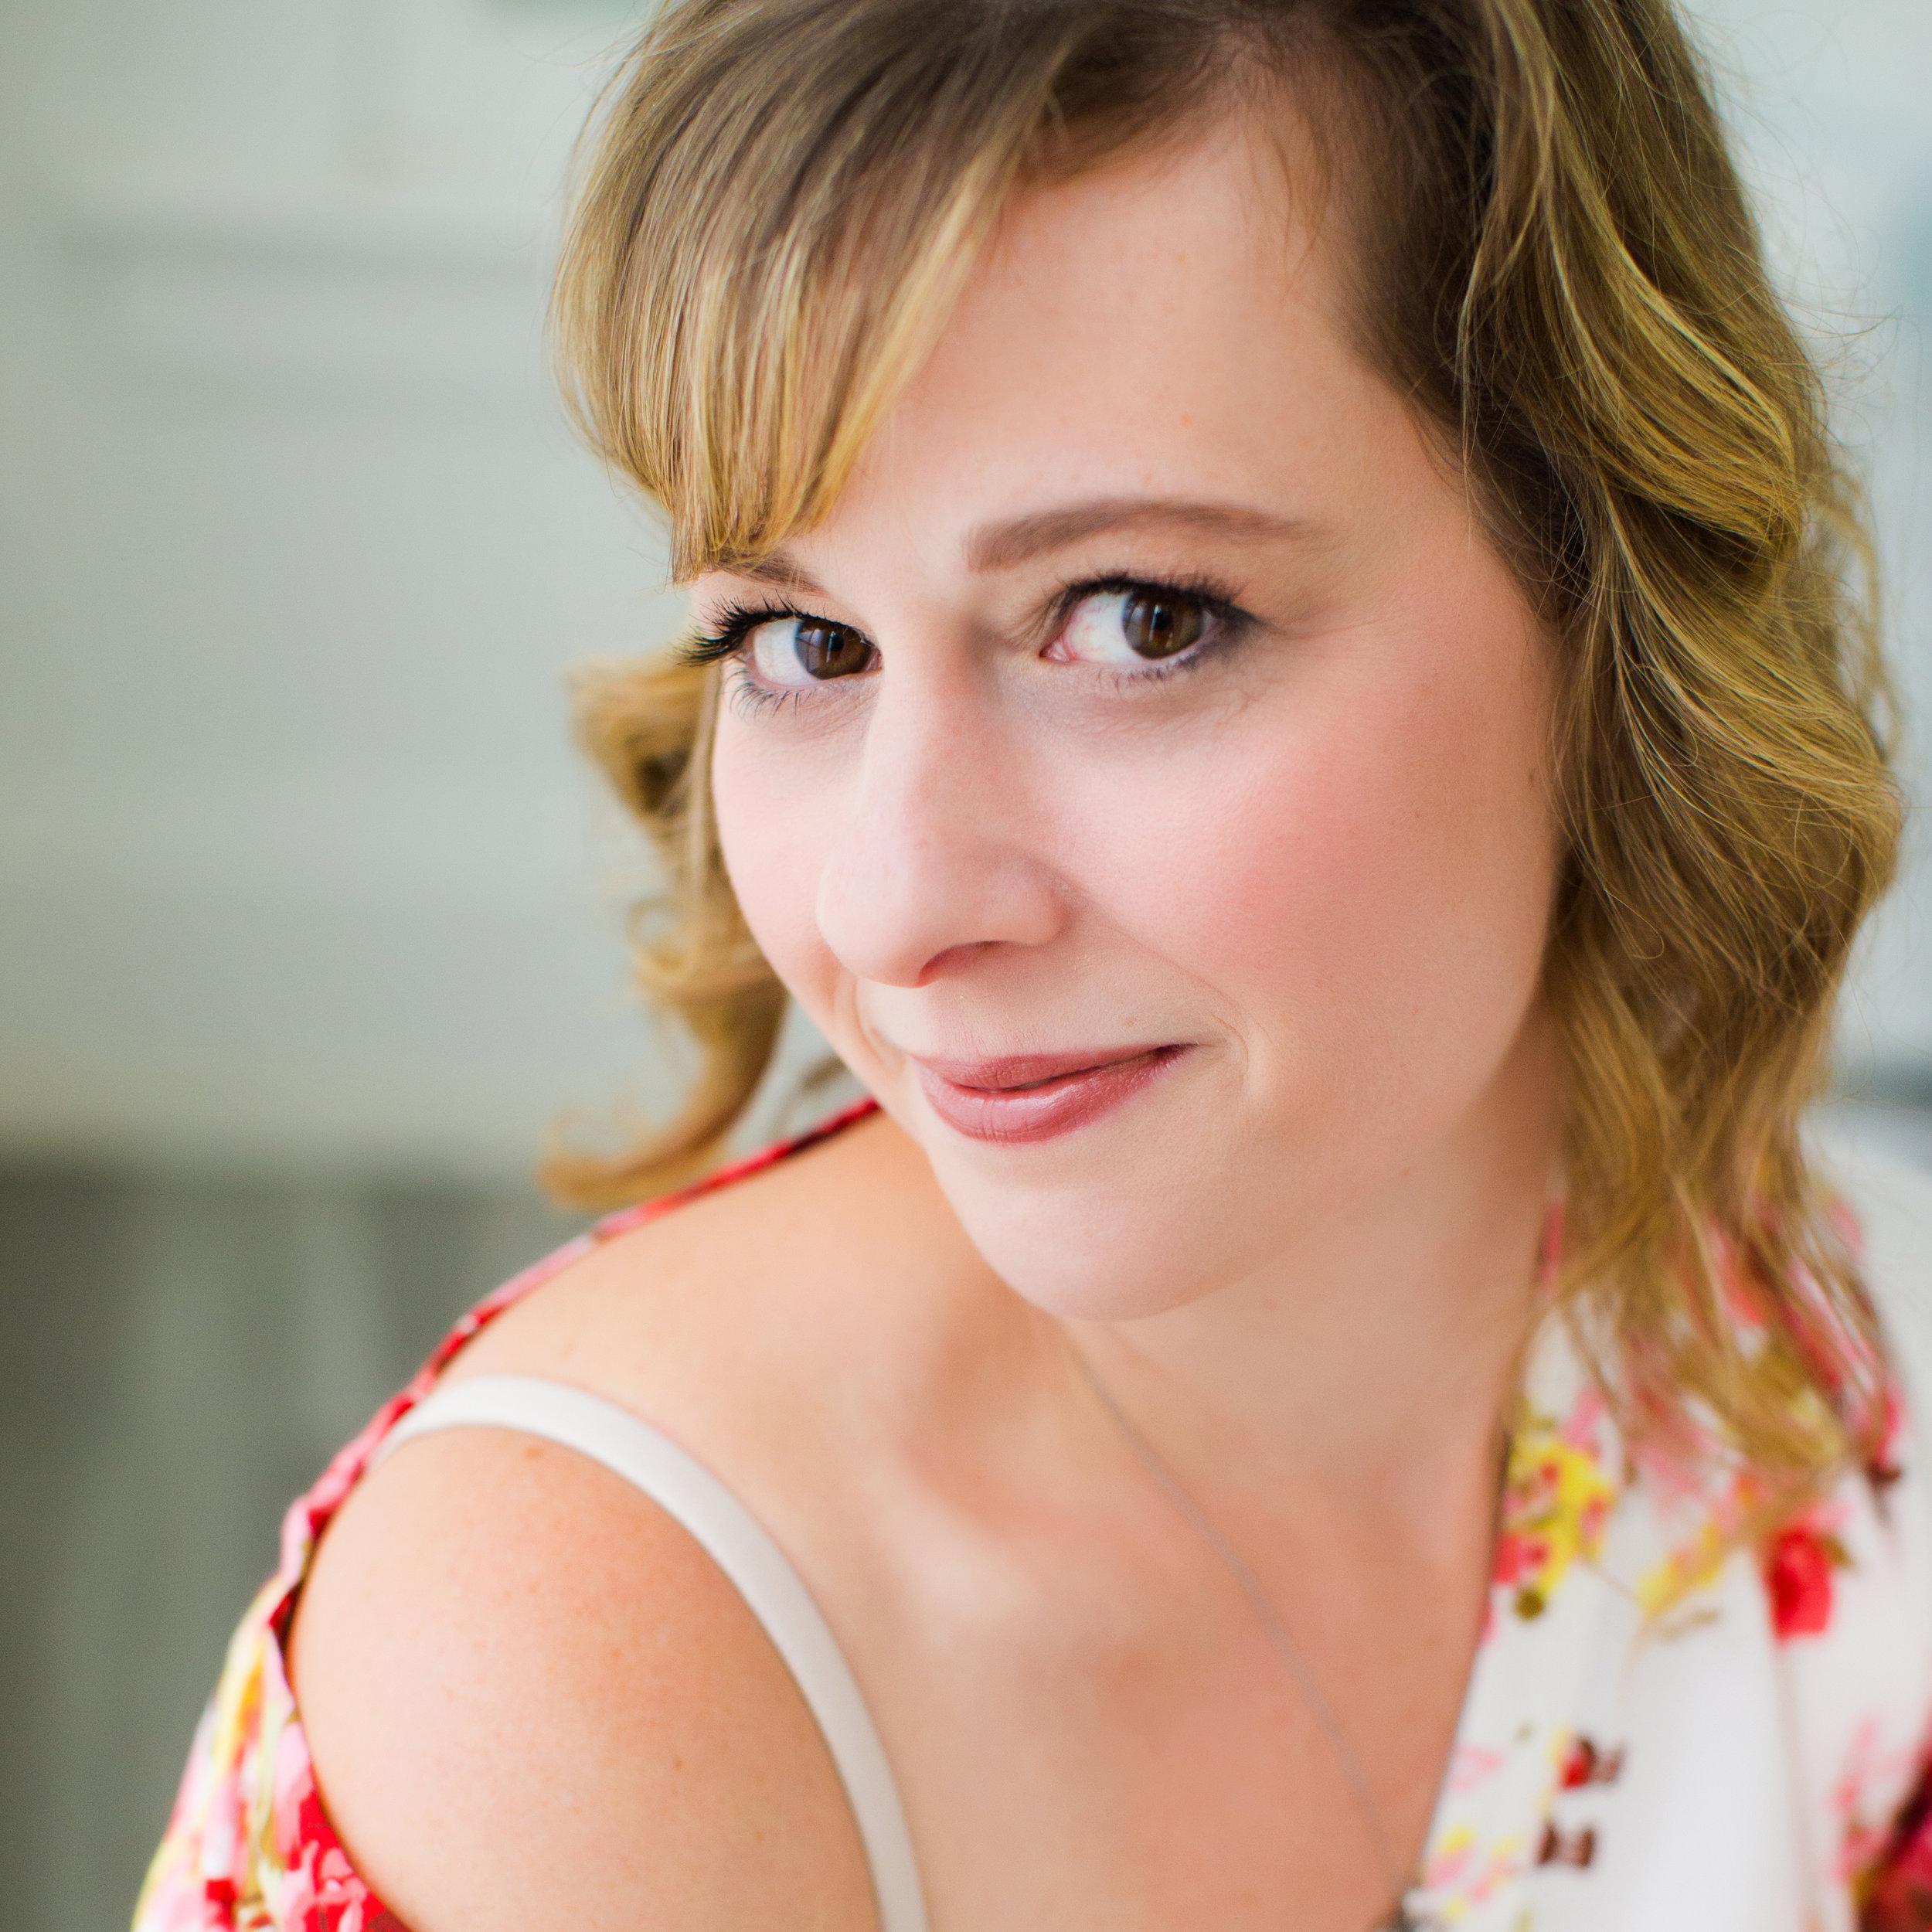 Natasha Scrivens | Age: 36 | Profession: Pharmacist